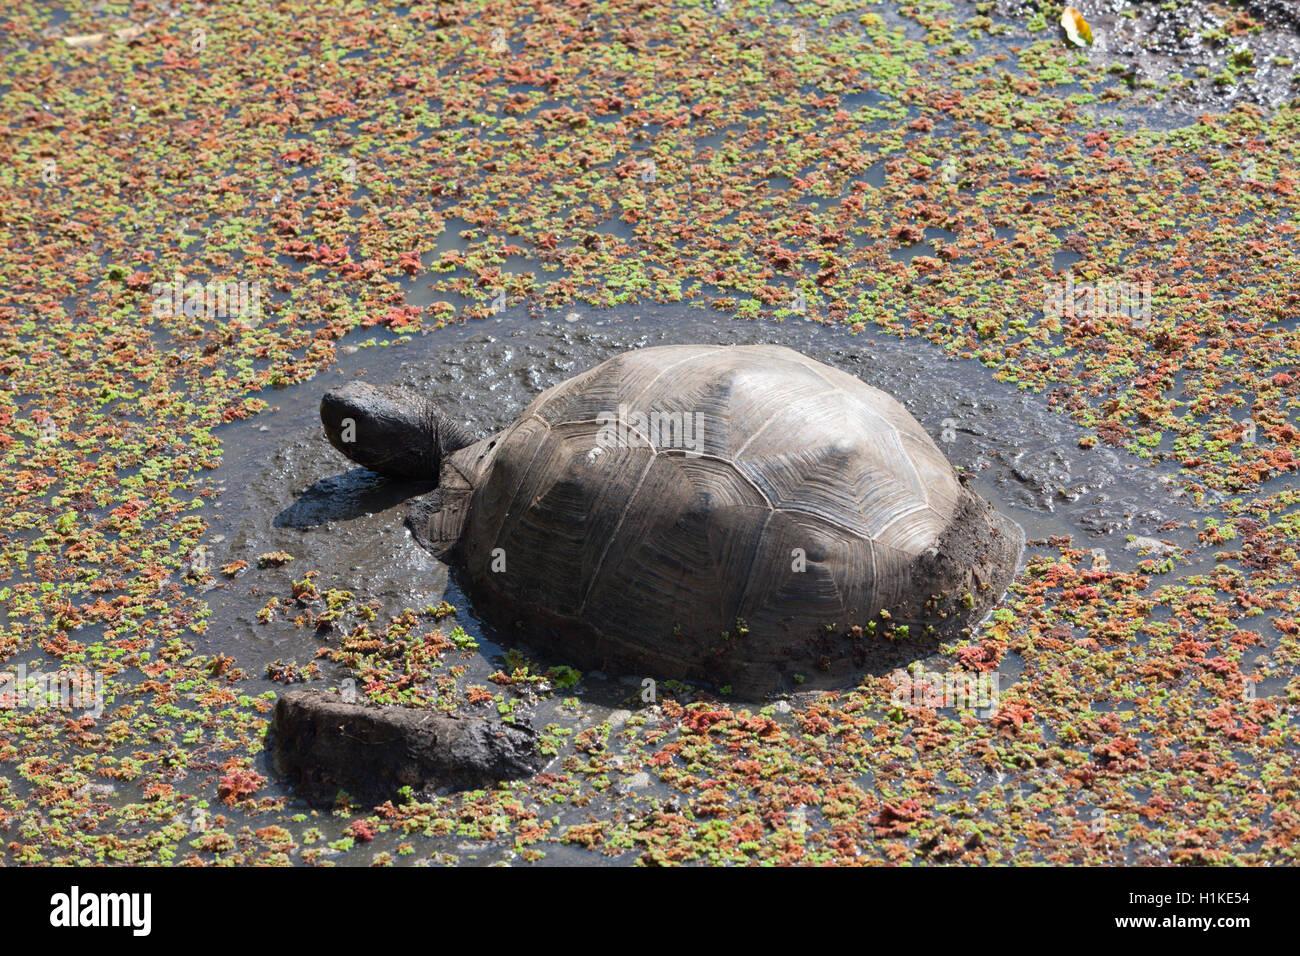 Galapagos Giant Tortoise, Chelonoidis nigra, Santa Cruz Island, Galapagos, Ecuador - Stock Image